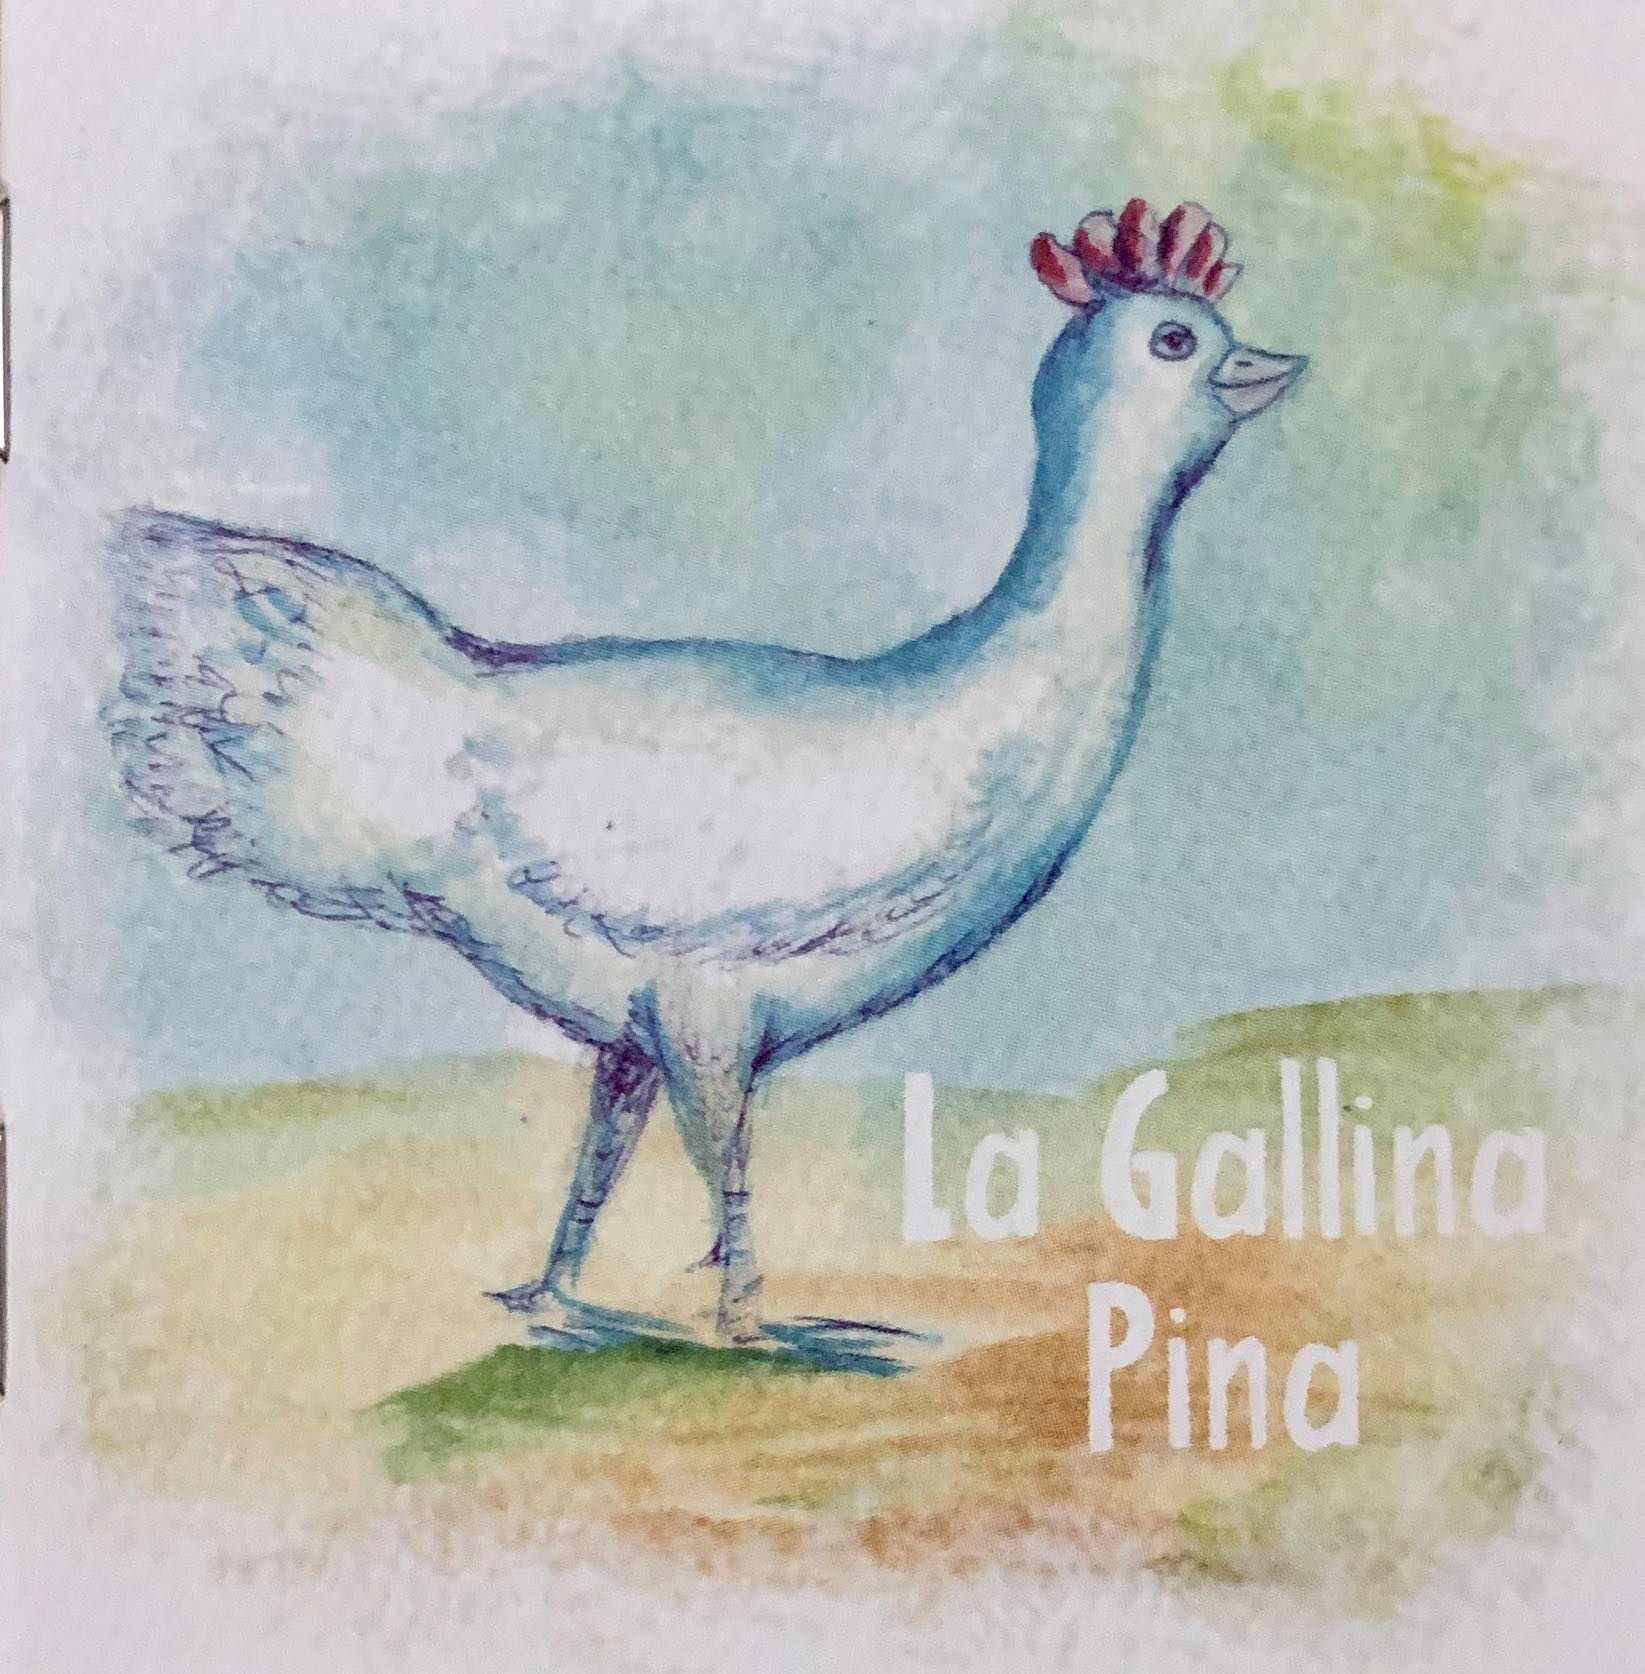 La gallina Pina